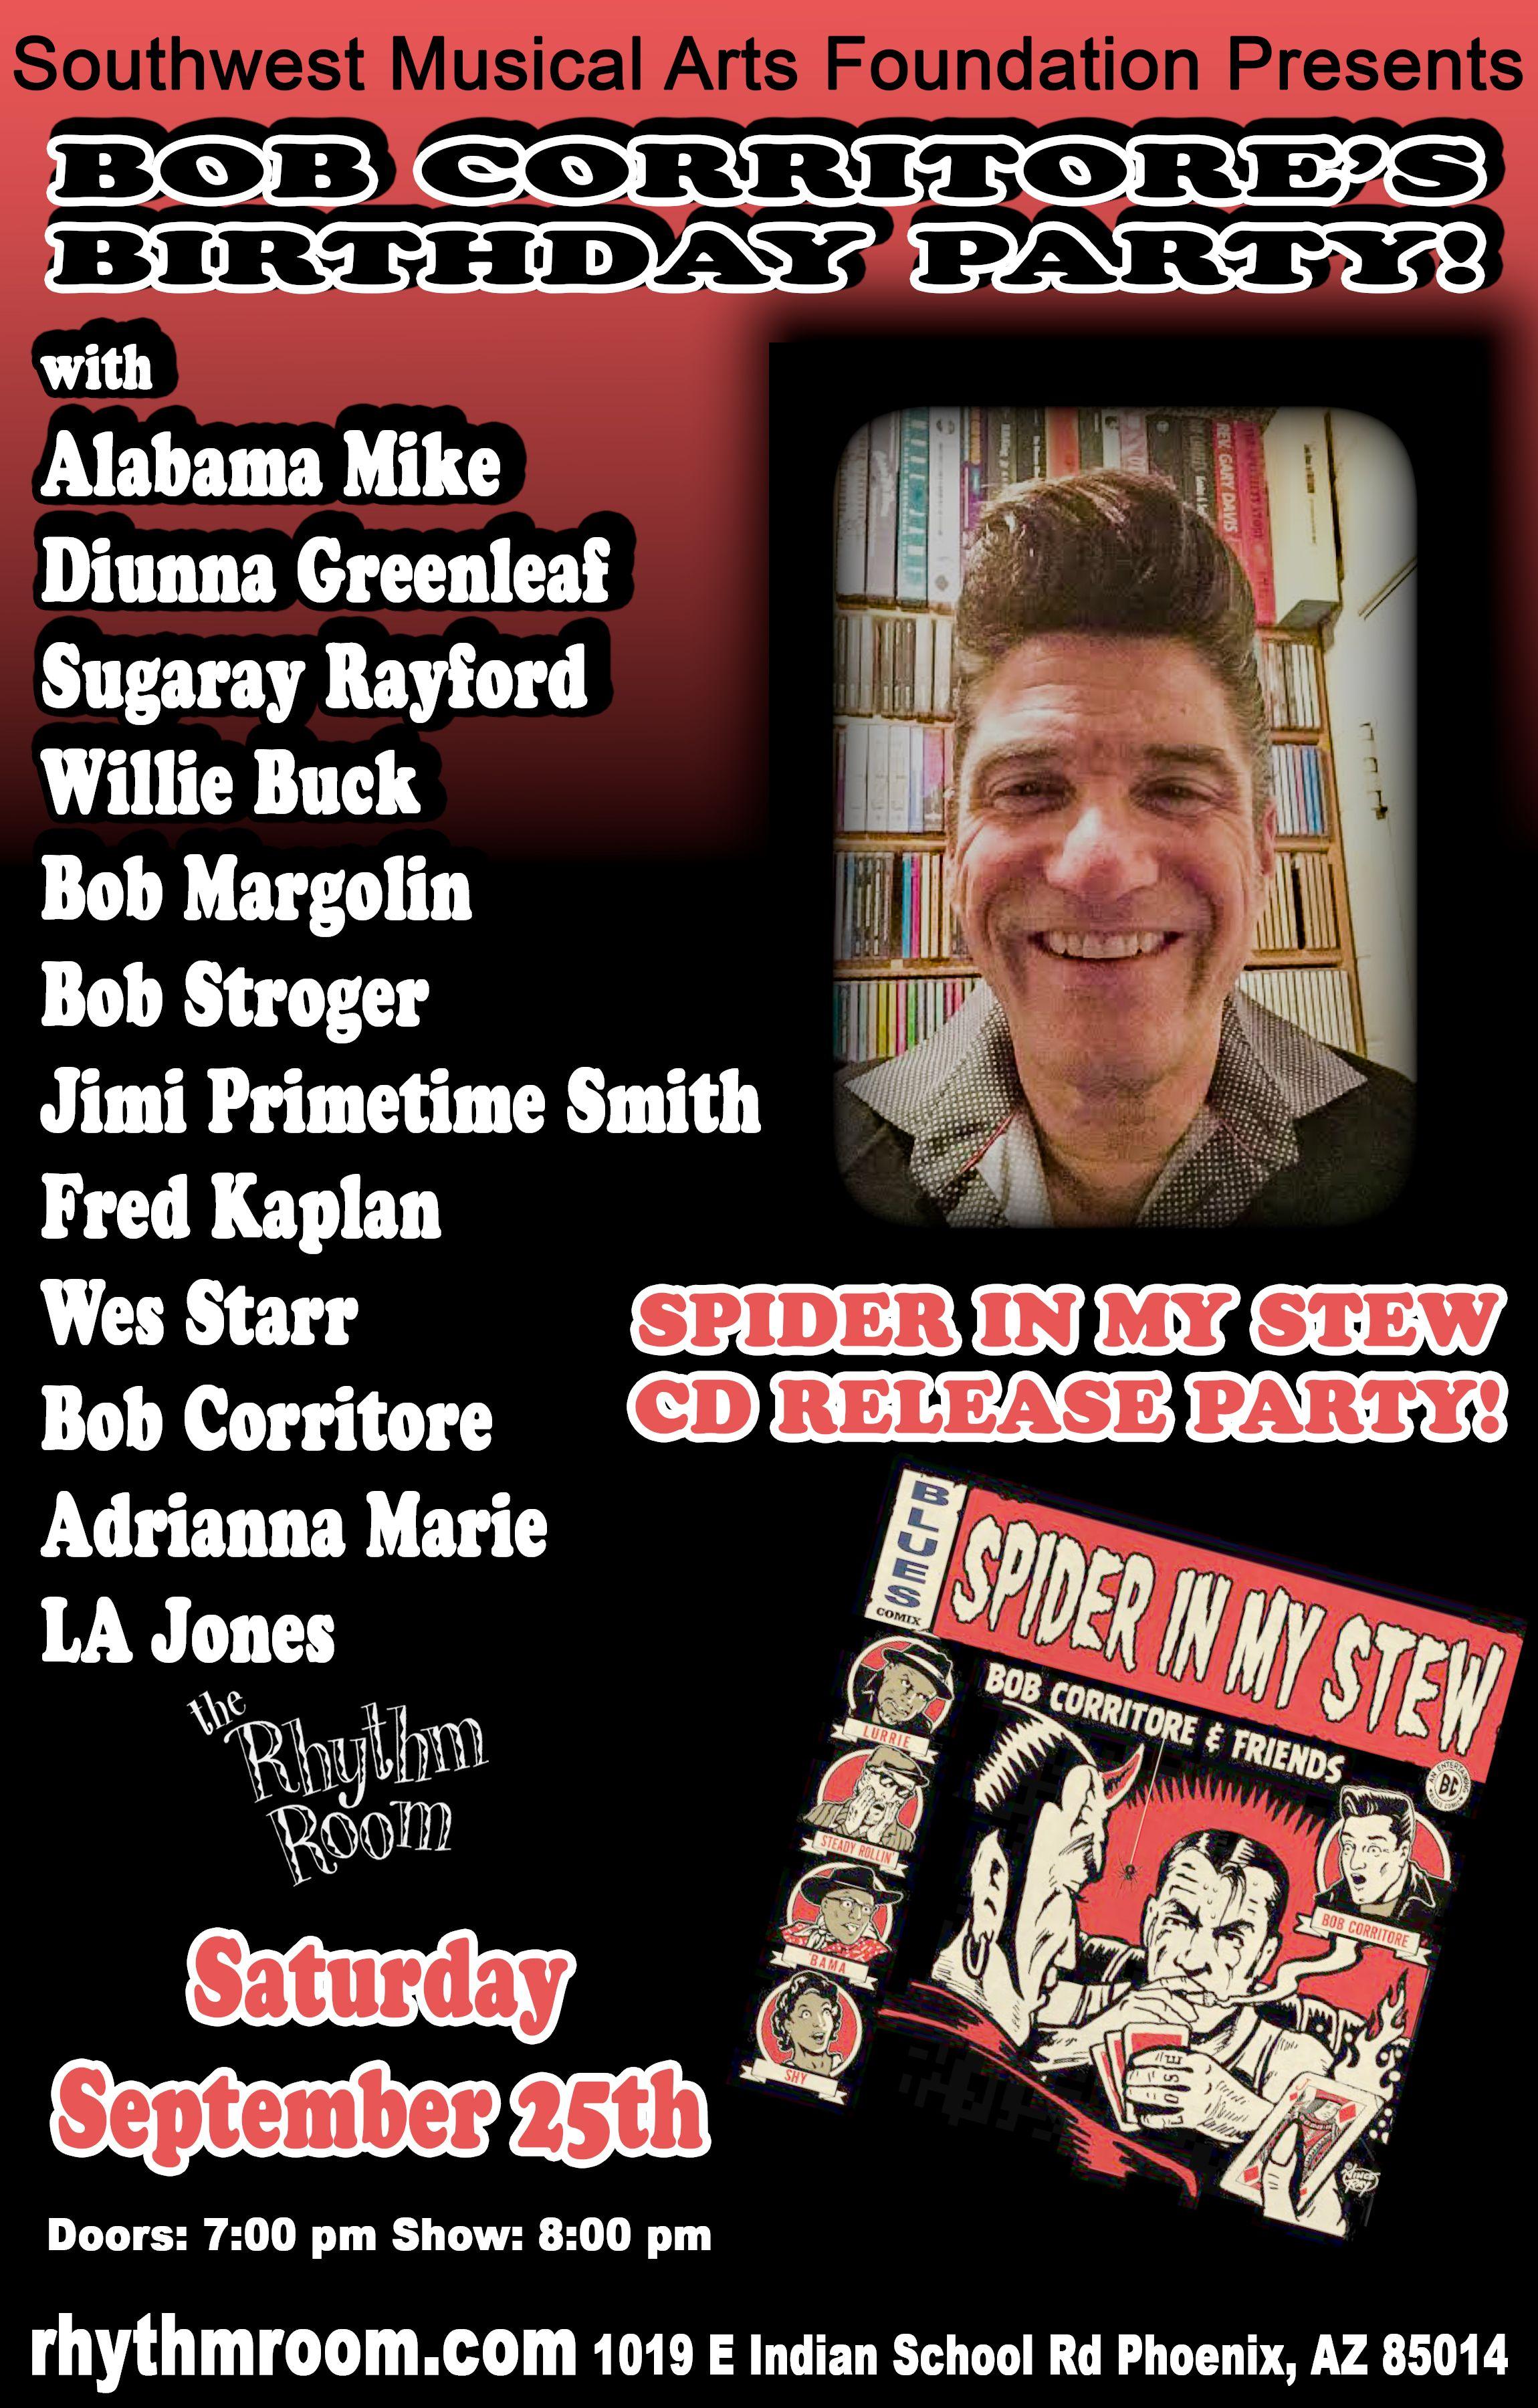 Bob Corritore's Birthday Party!: